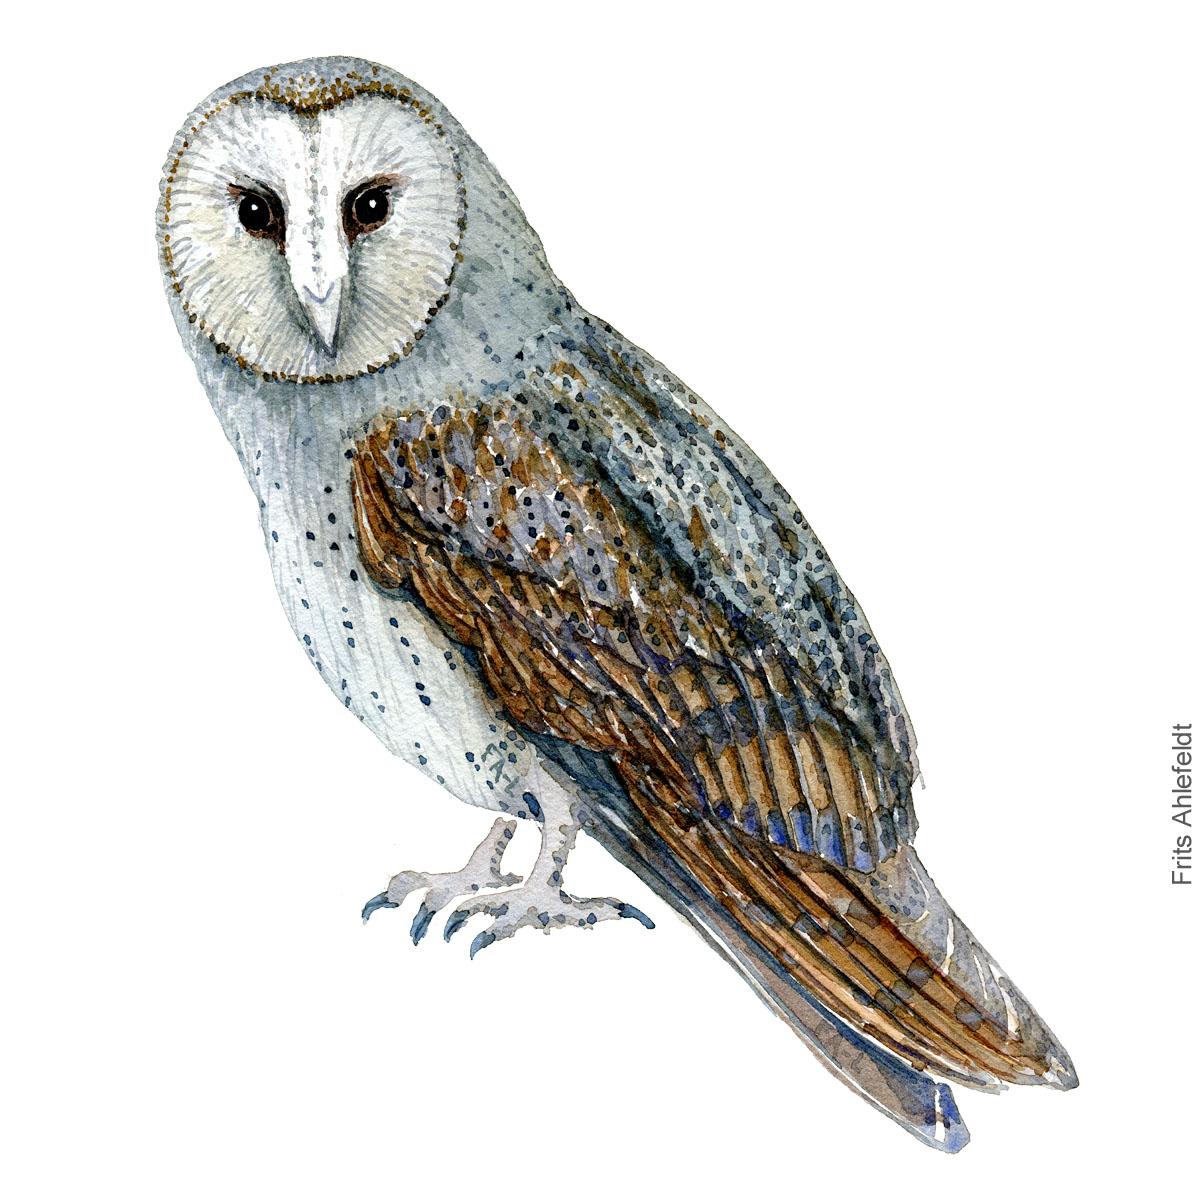 Slorugle - Barnowl - Bird watercolor painting. Artwork by Frits Ahlefeldt. Fugle akvarel